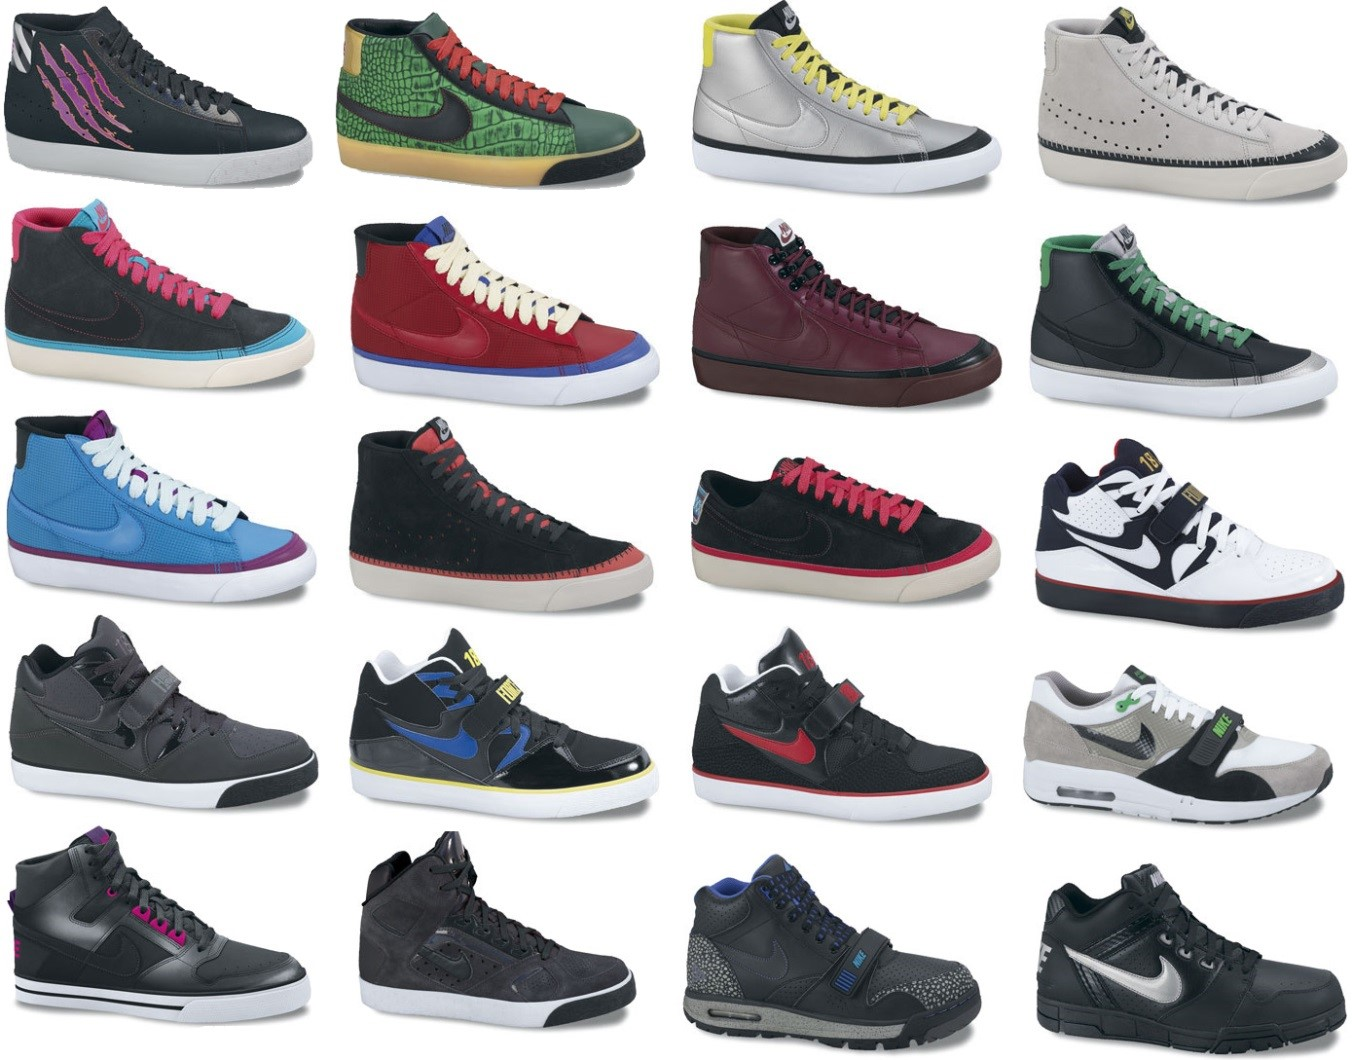 Los mejores cat logos de zapatos mucha m s moda for Zapatos por catalogo